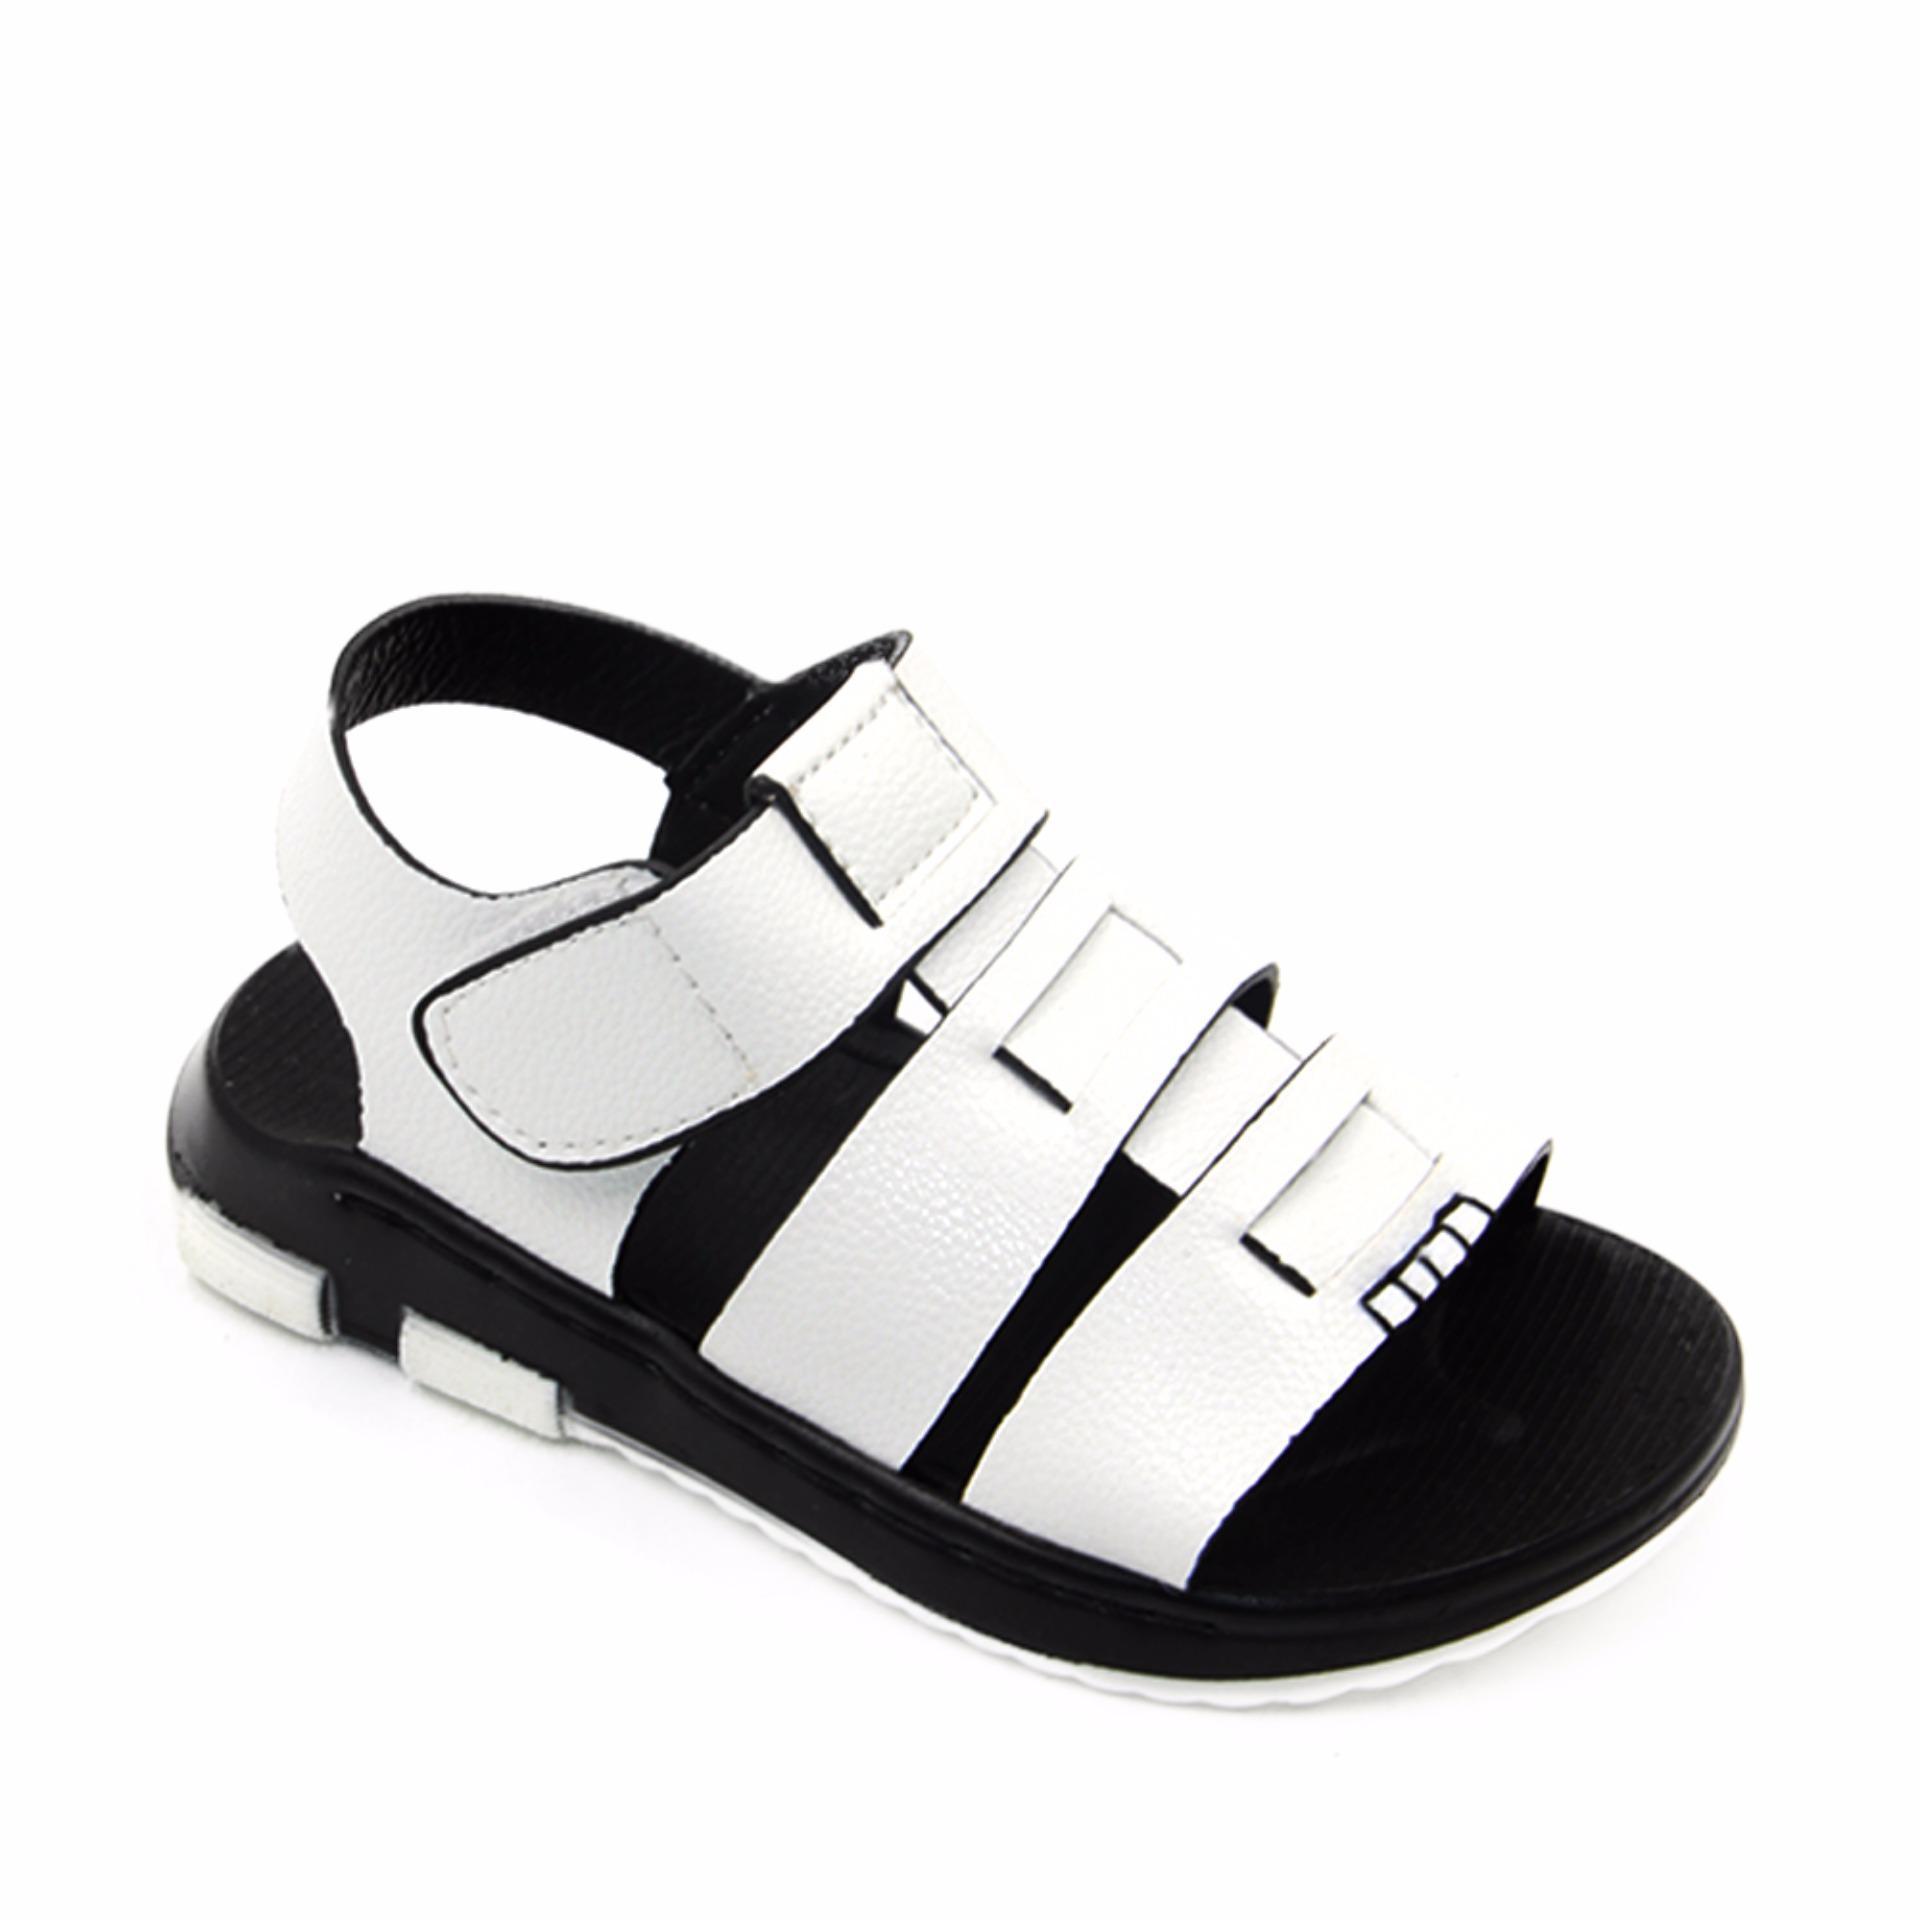 Diskon Produk Faster Sandal Anak 172 Whitesize 27 31